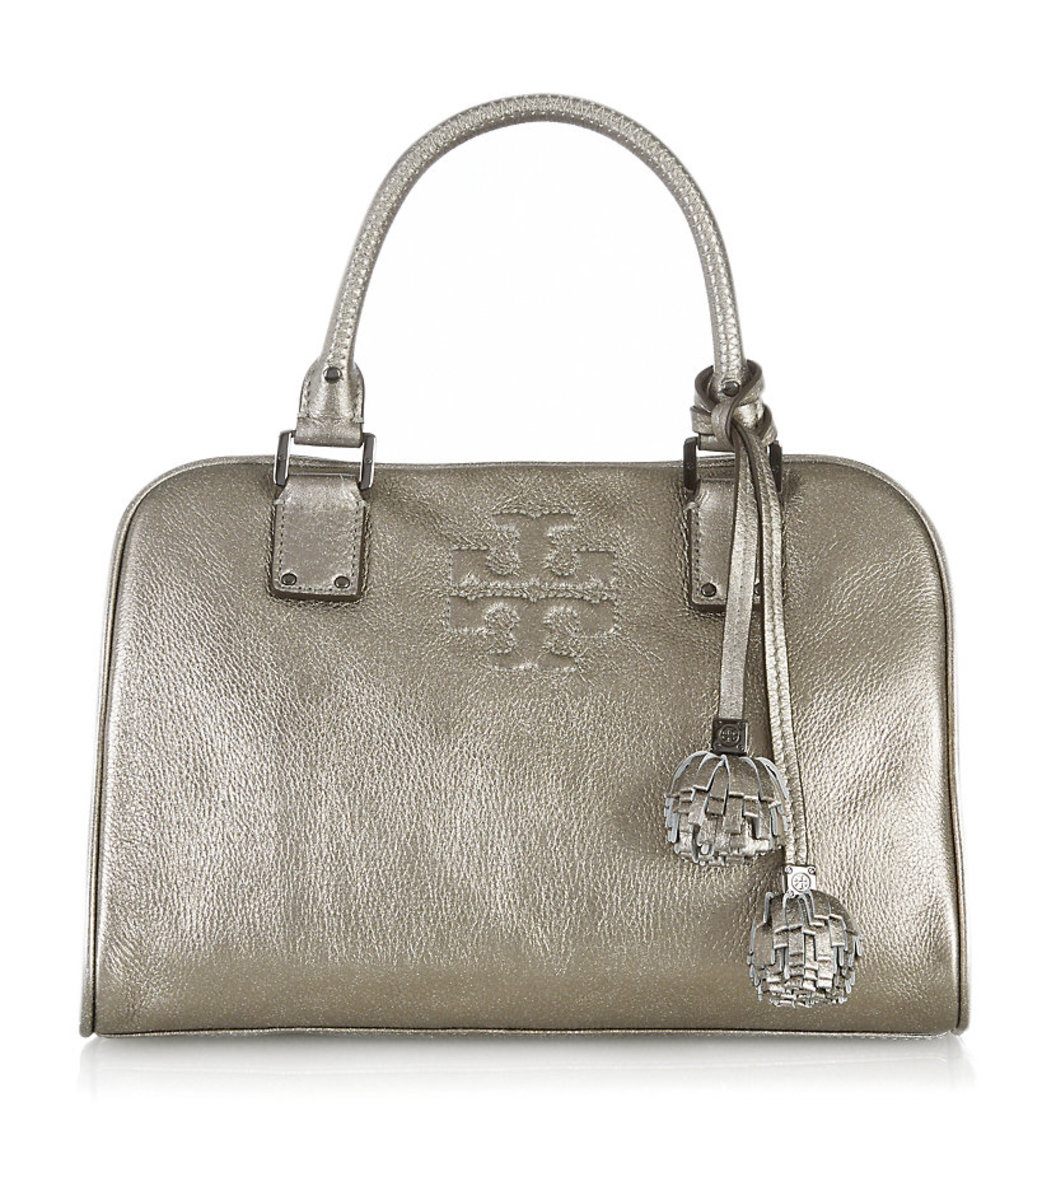 This Handbag is by Tory Burch